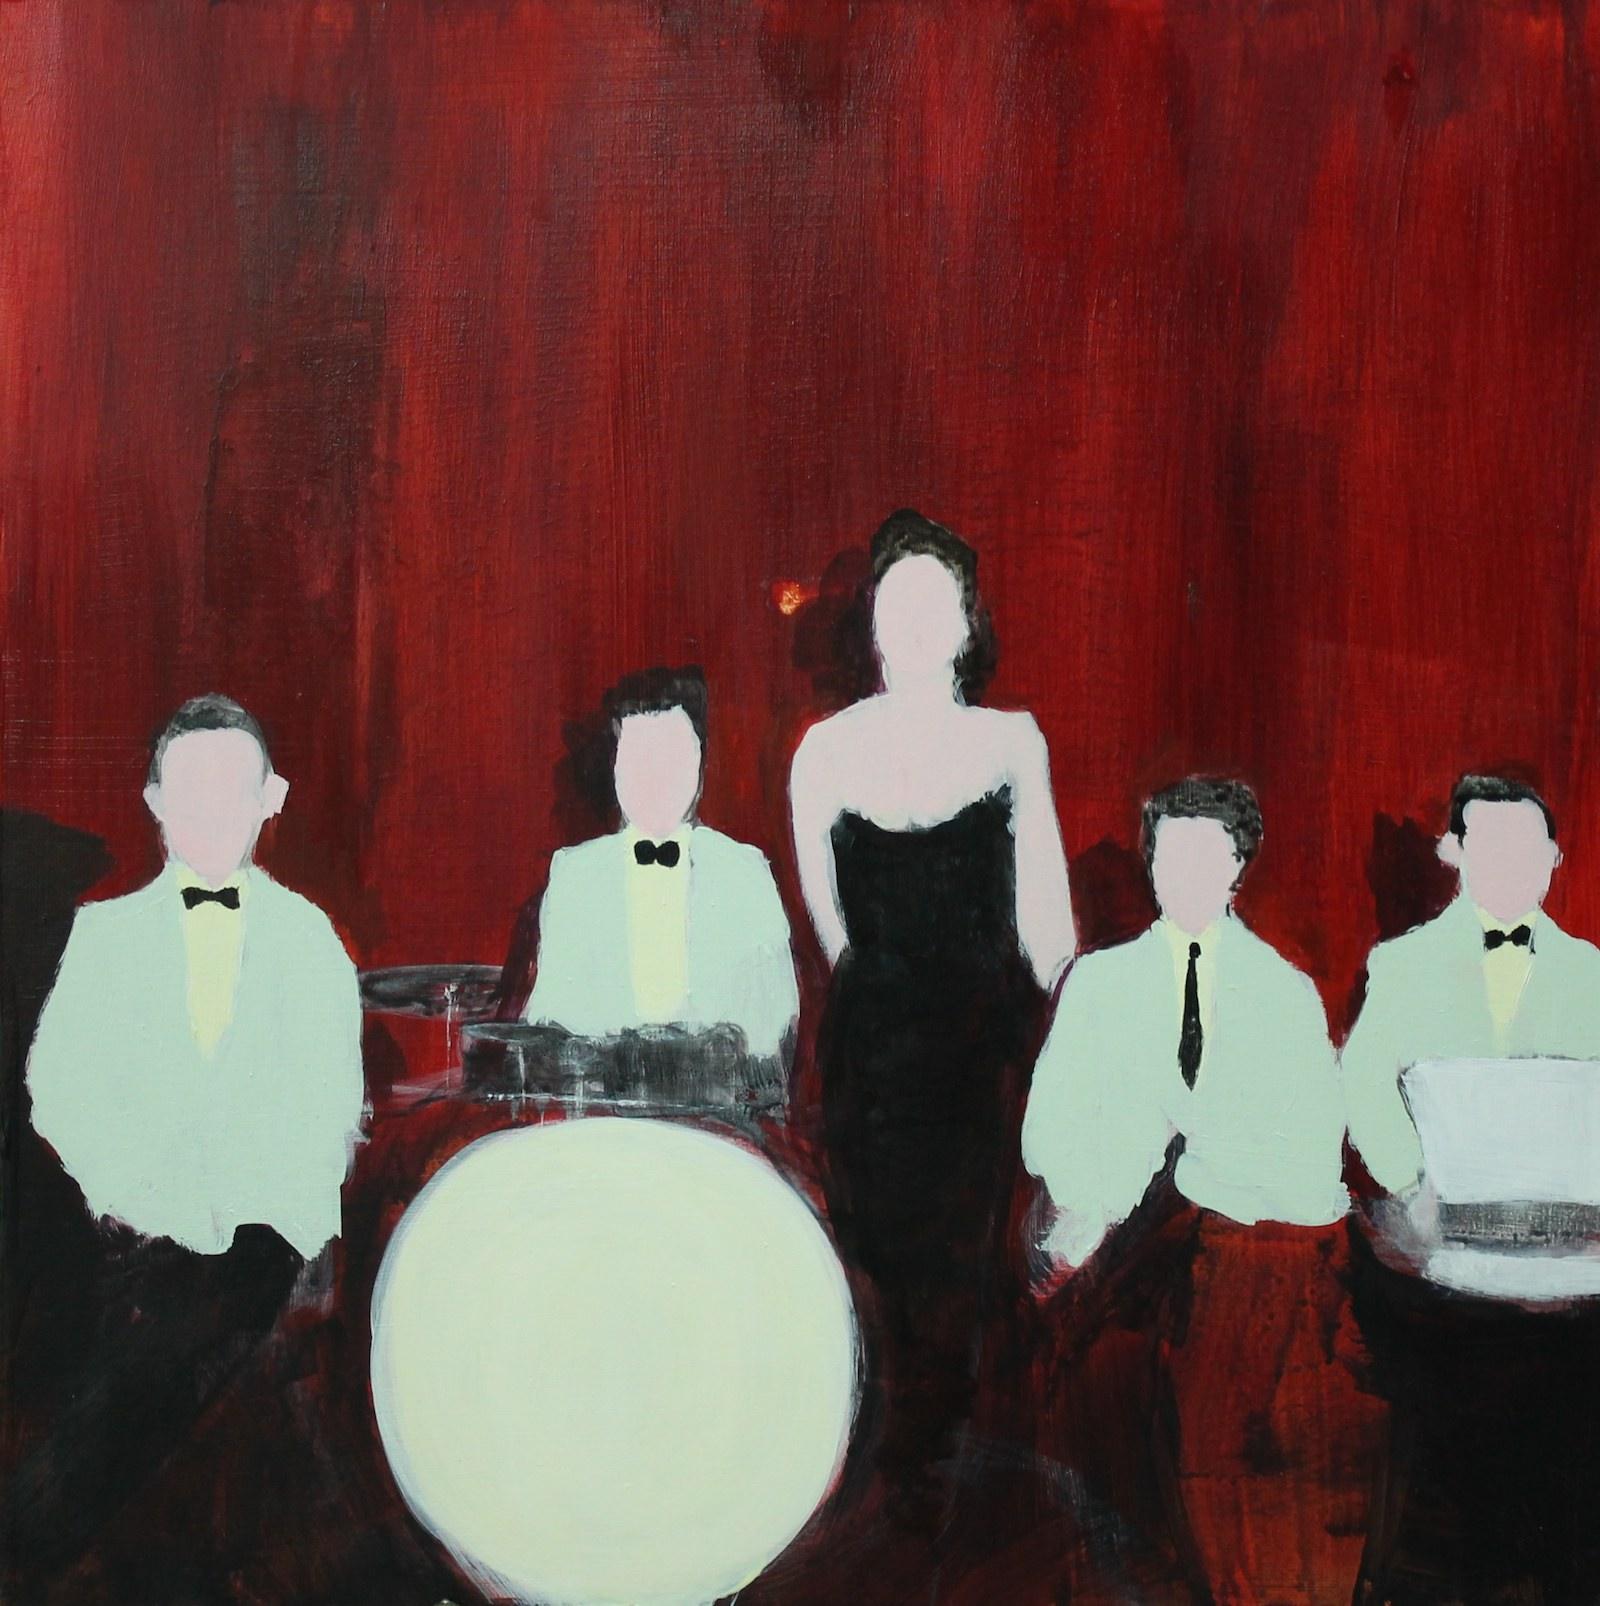 The Twilight Serenaders Dance Band, Ballina, 1945 40 cm x 40 cm, acrylic on mdf, 2019